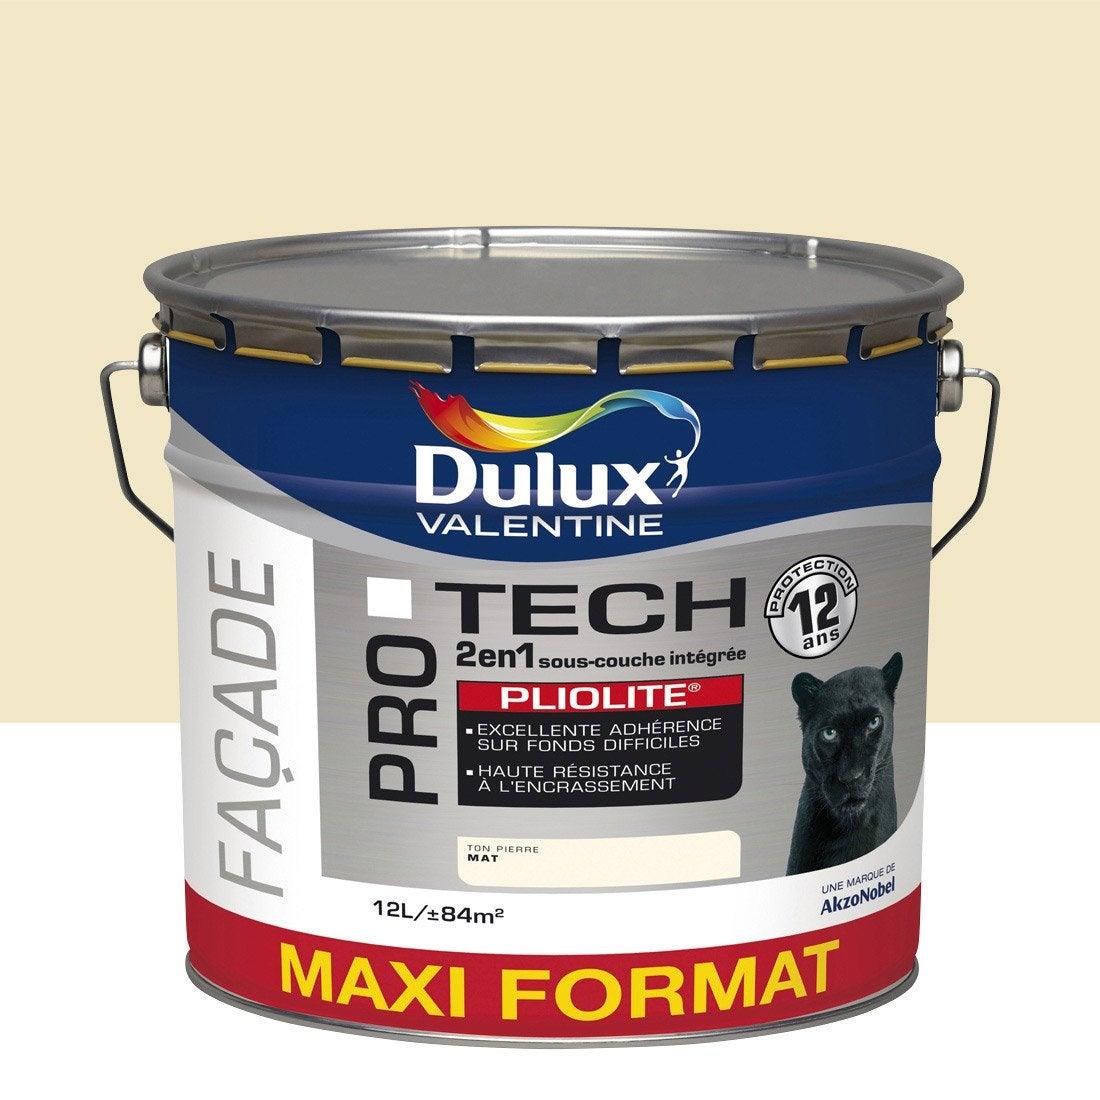 Peinture fa ade protech pliolite dulux valentine ton for Peinture facade pliolite